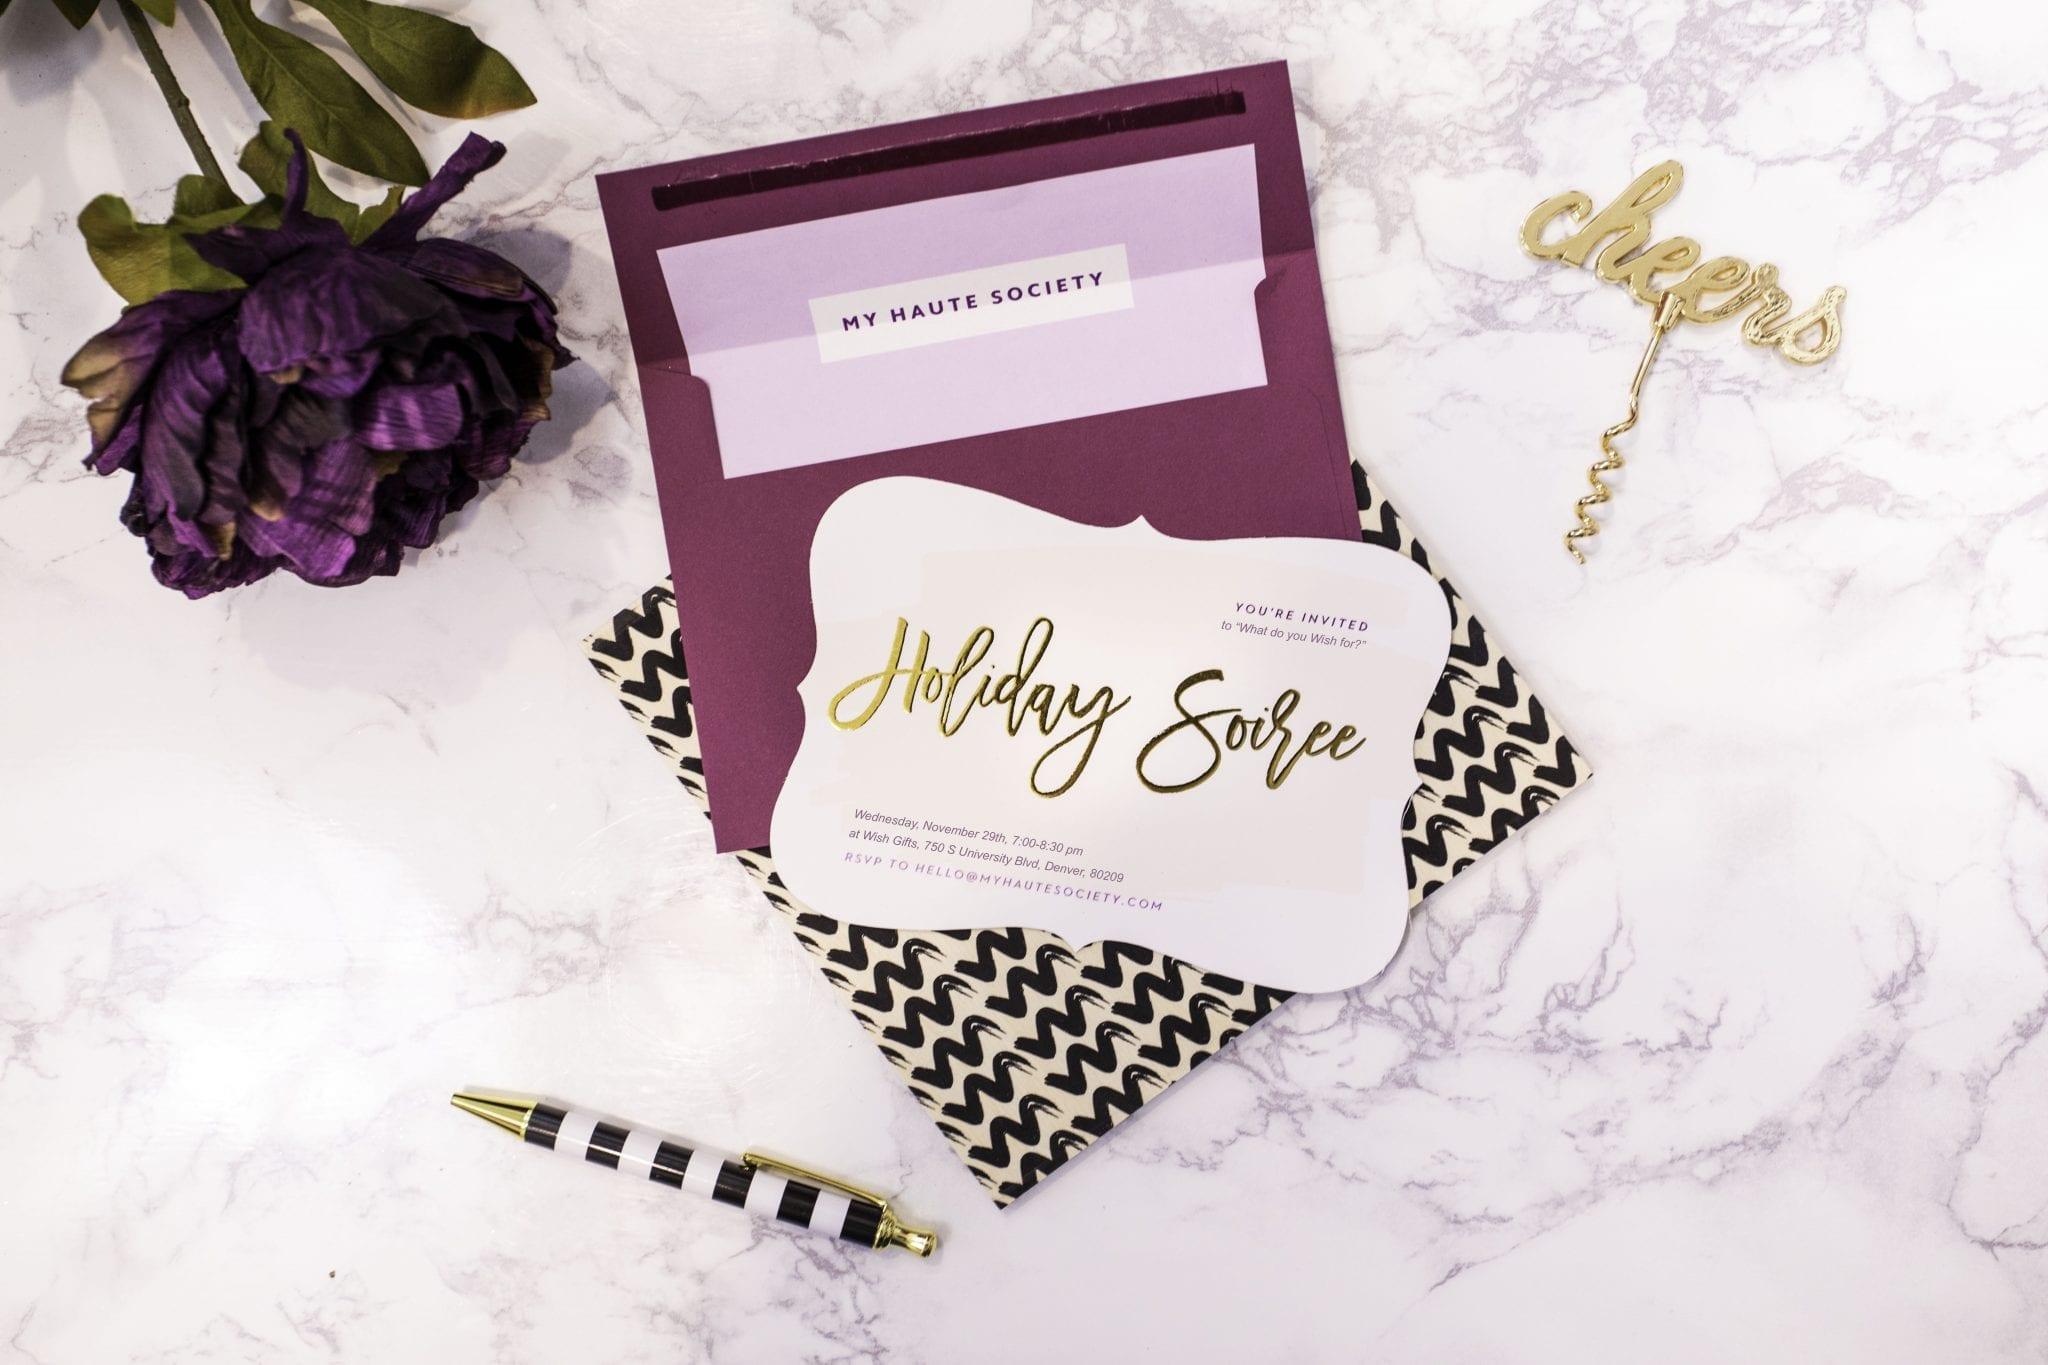 holiday invites | holiday party invitation | basic invite | christmas party invite custom